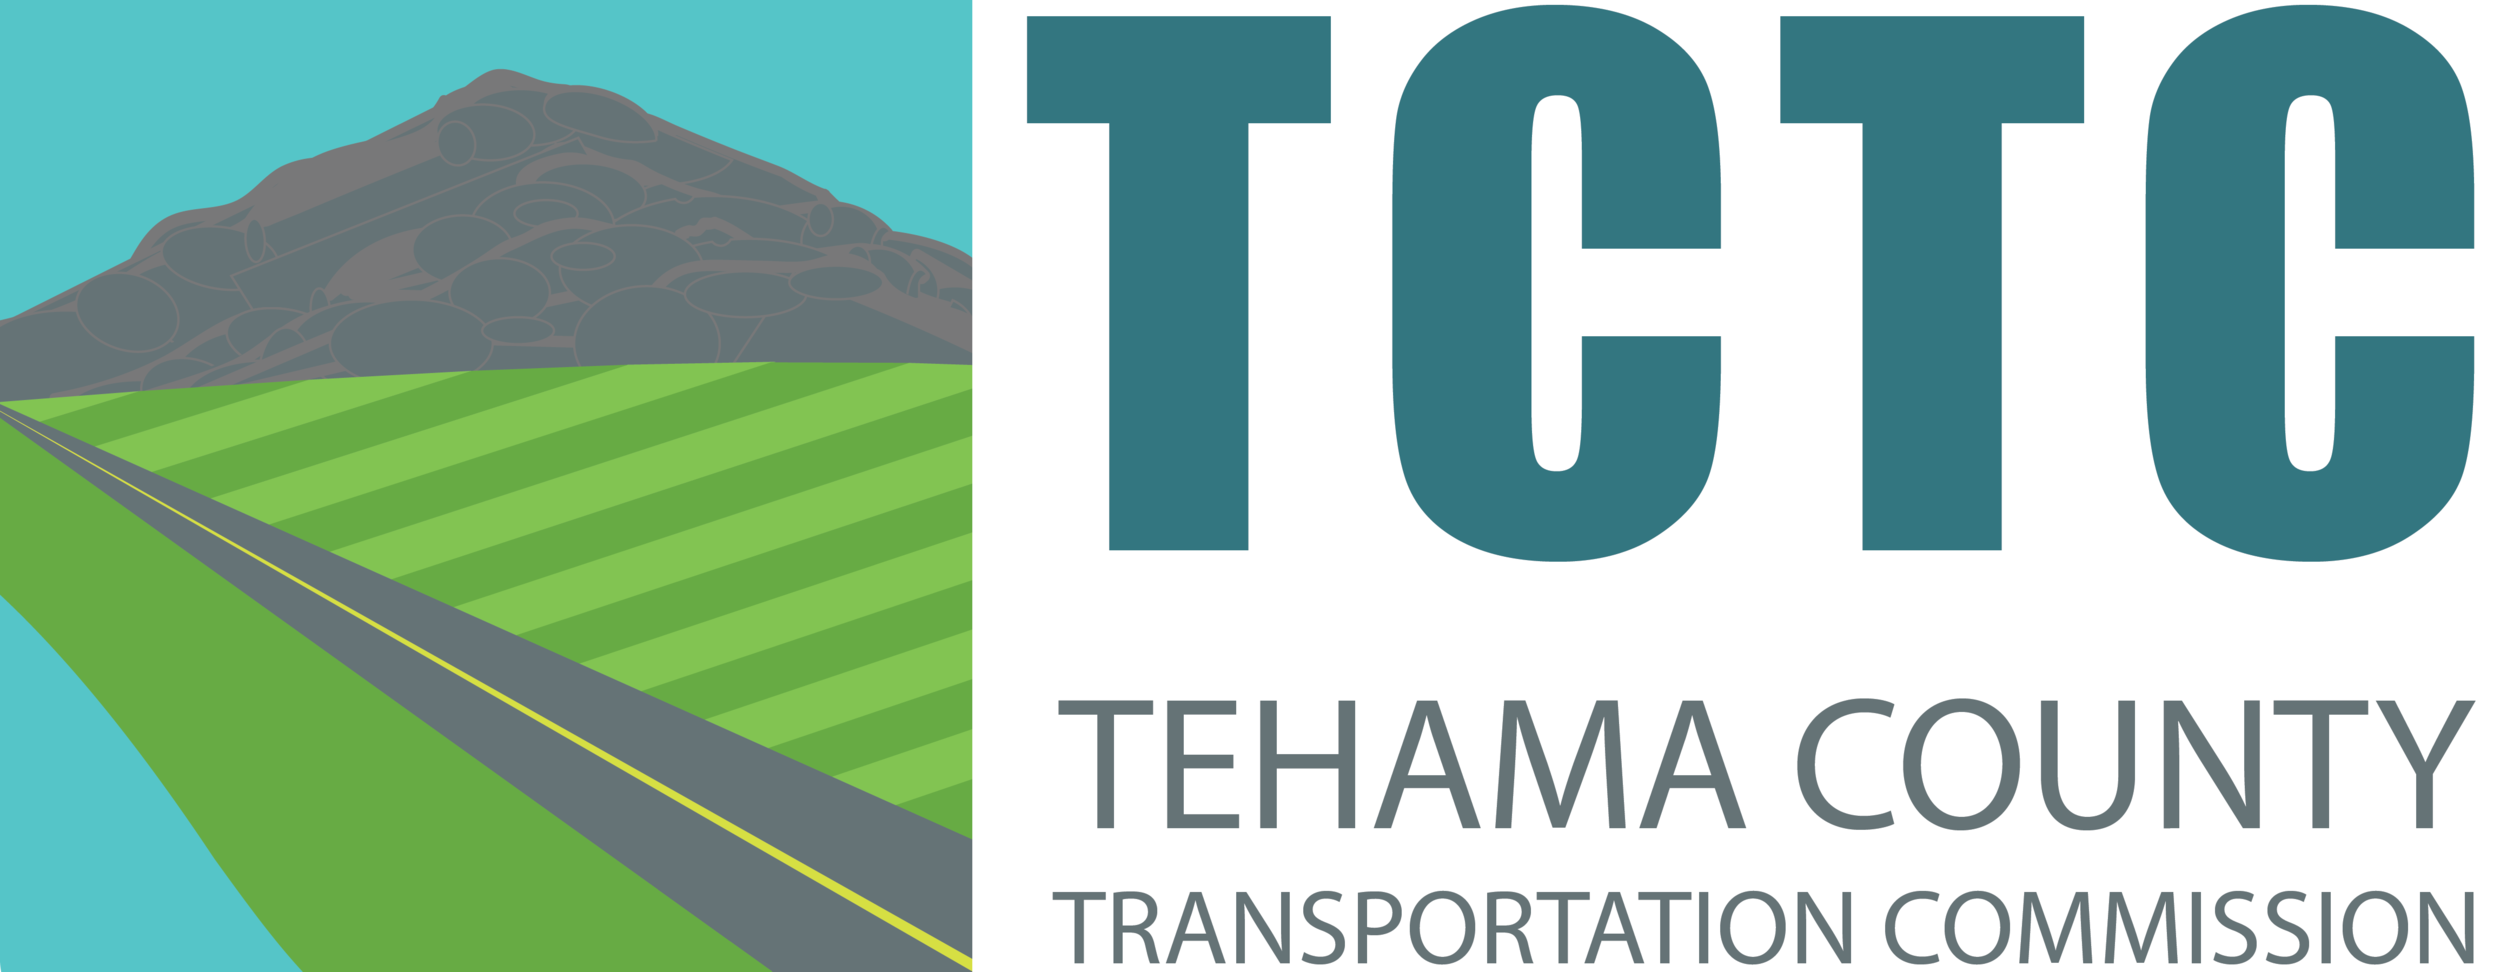 TCTCLogo-New-01.png